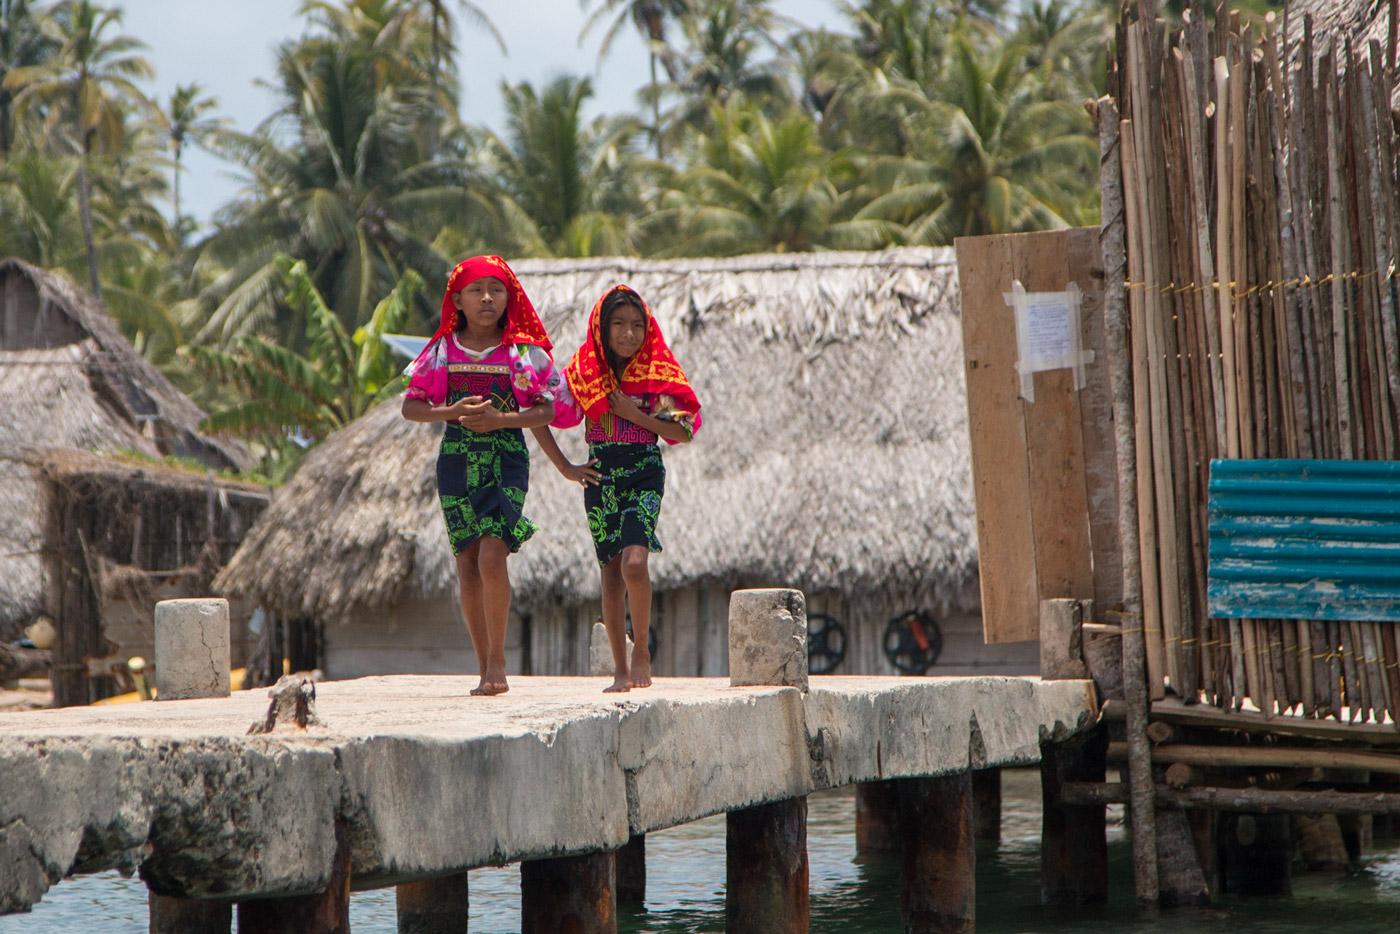 Kuna girls in traditional dress